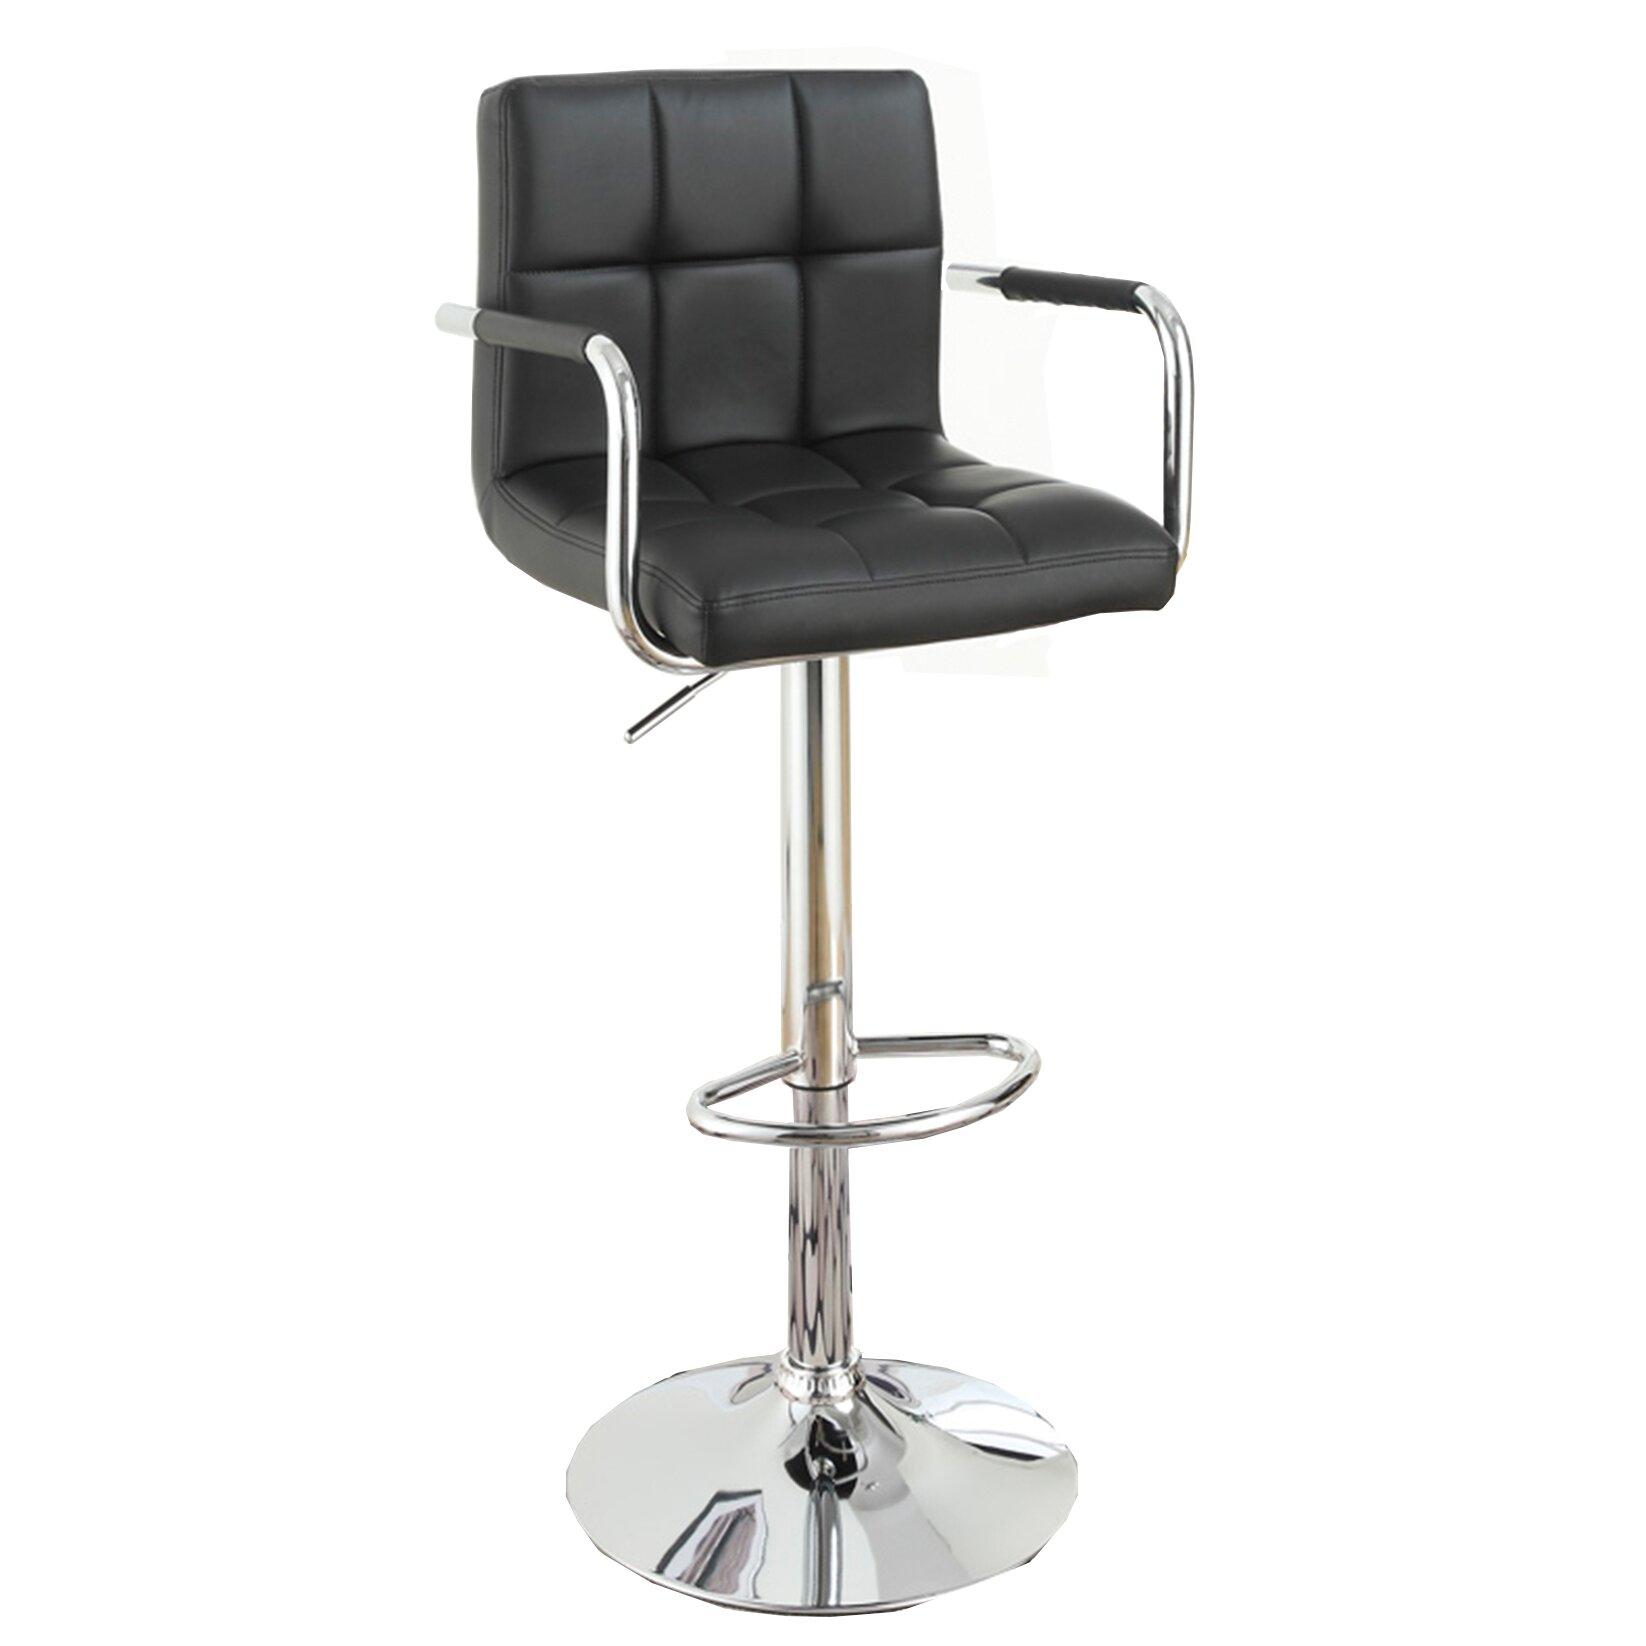 Poundex adjustable height swivel bar stool reviews wayfair for Adjustable height bar stools